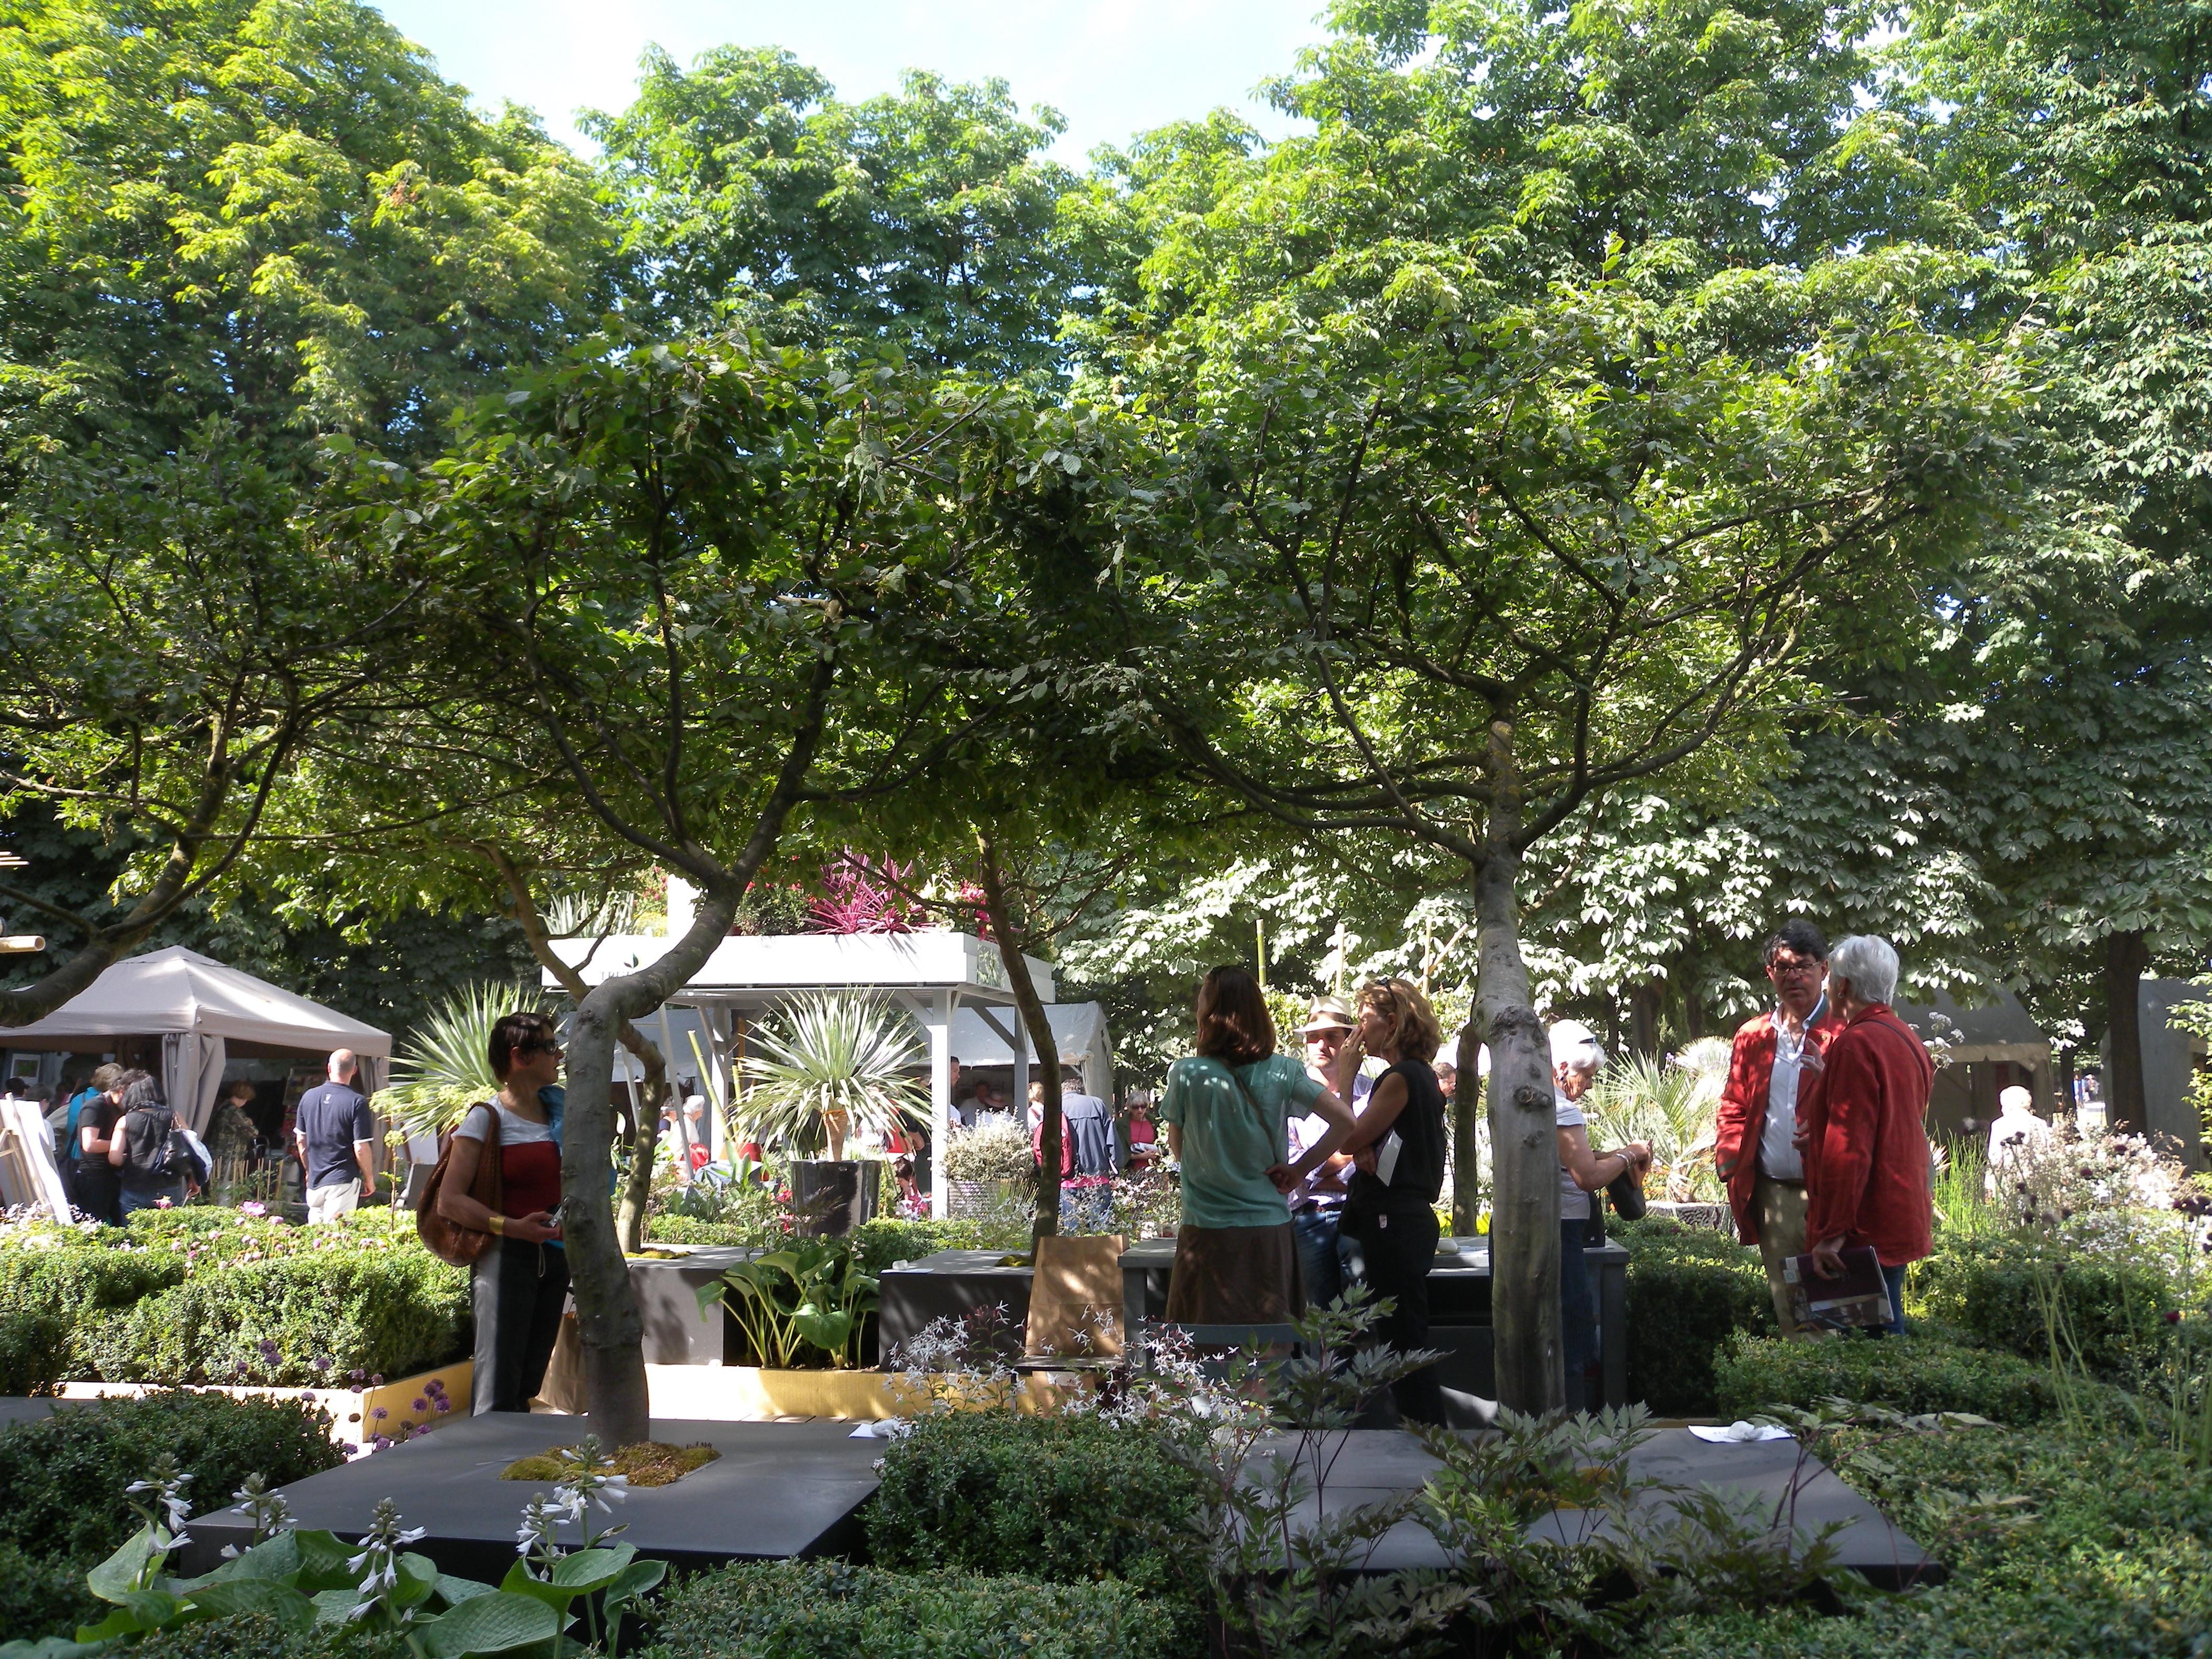 Jardin jardins aux tuileries garoli 39 s blogart for Jardin aux tuileries